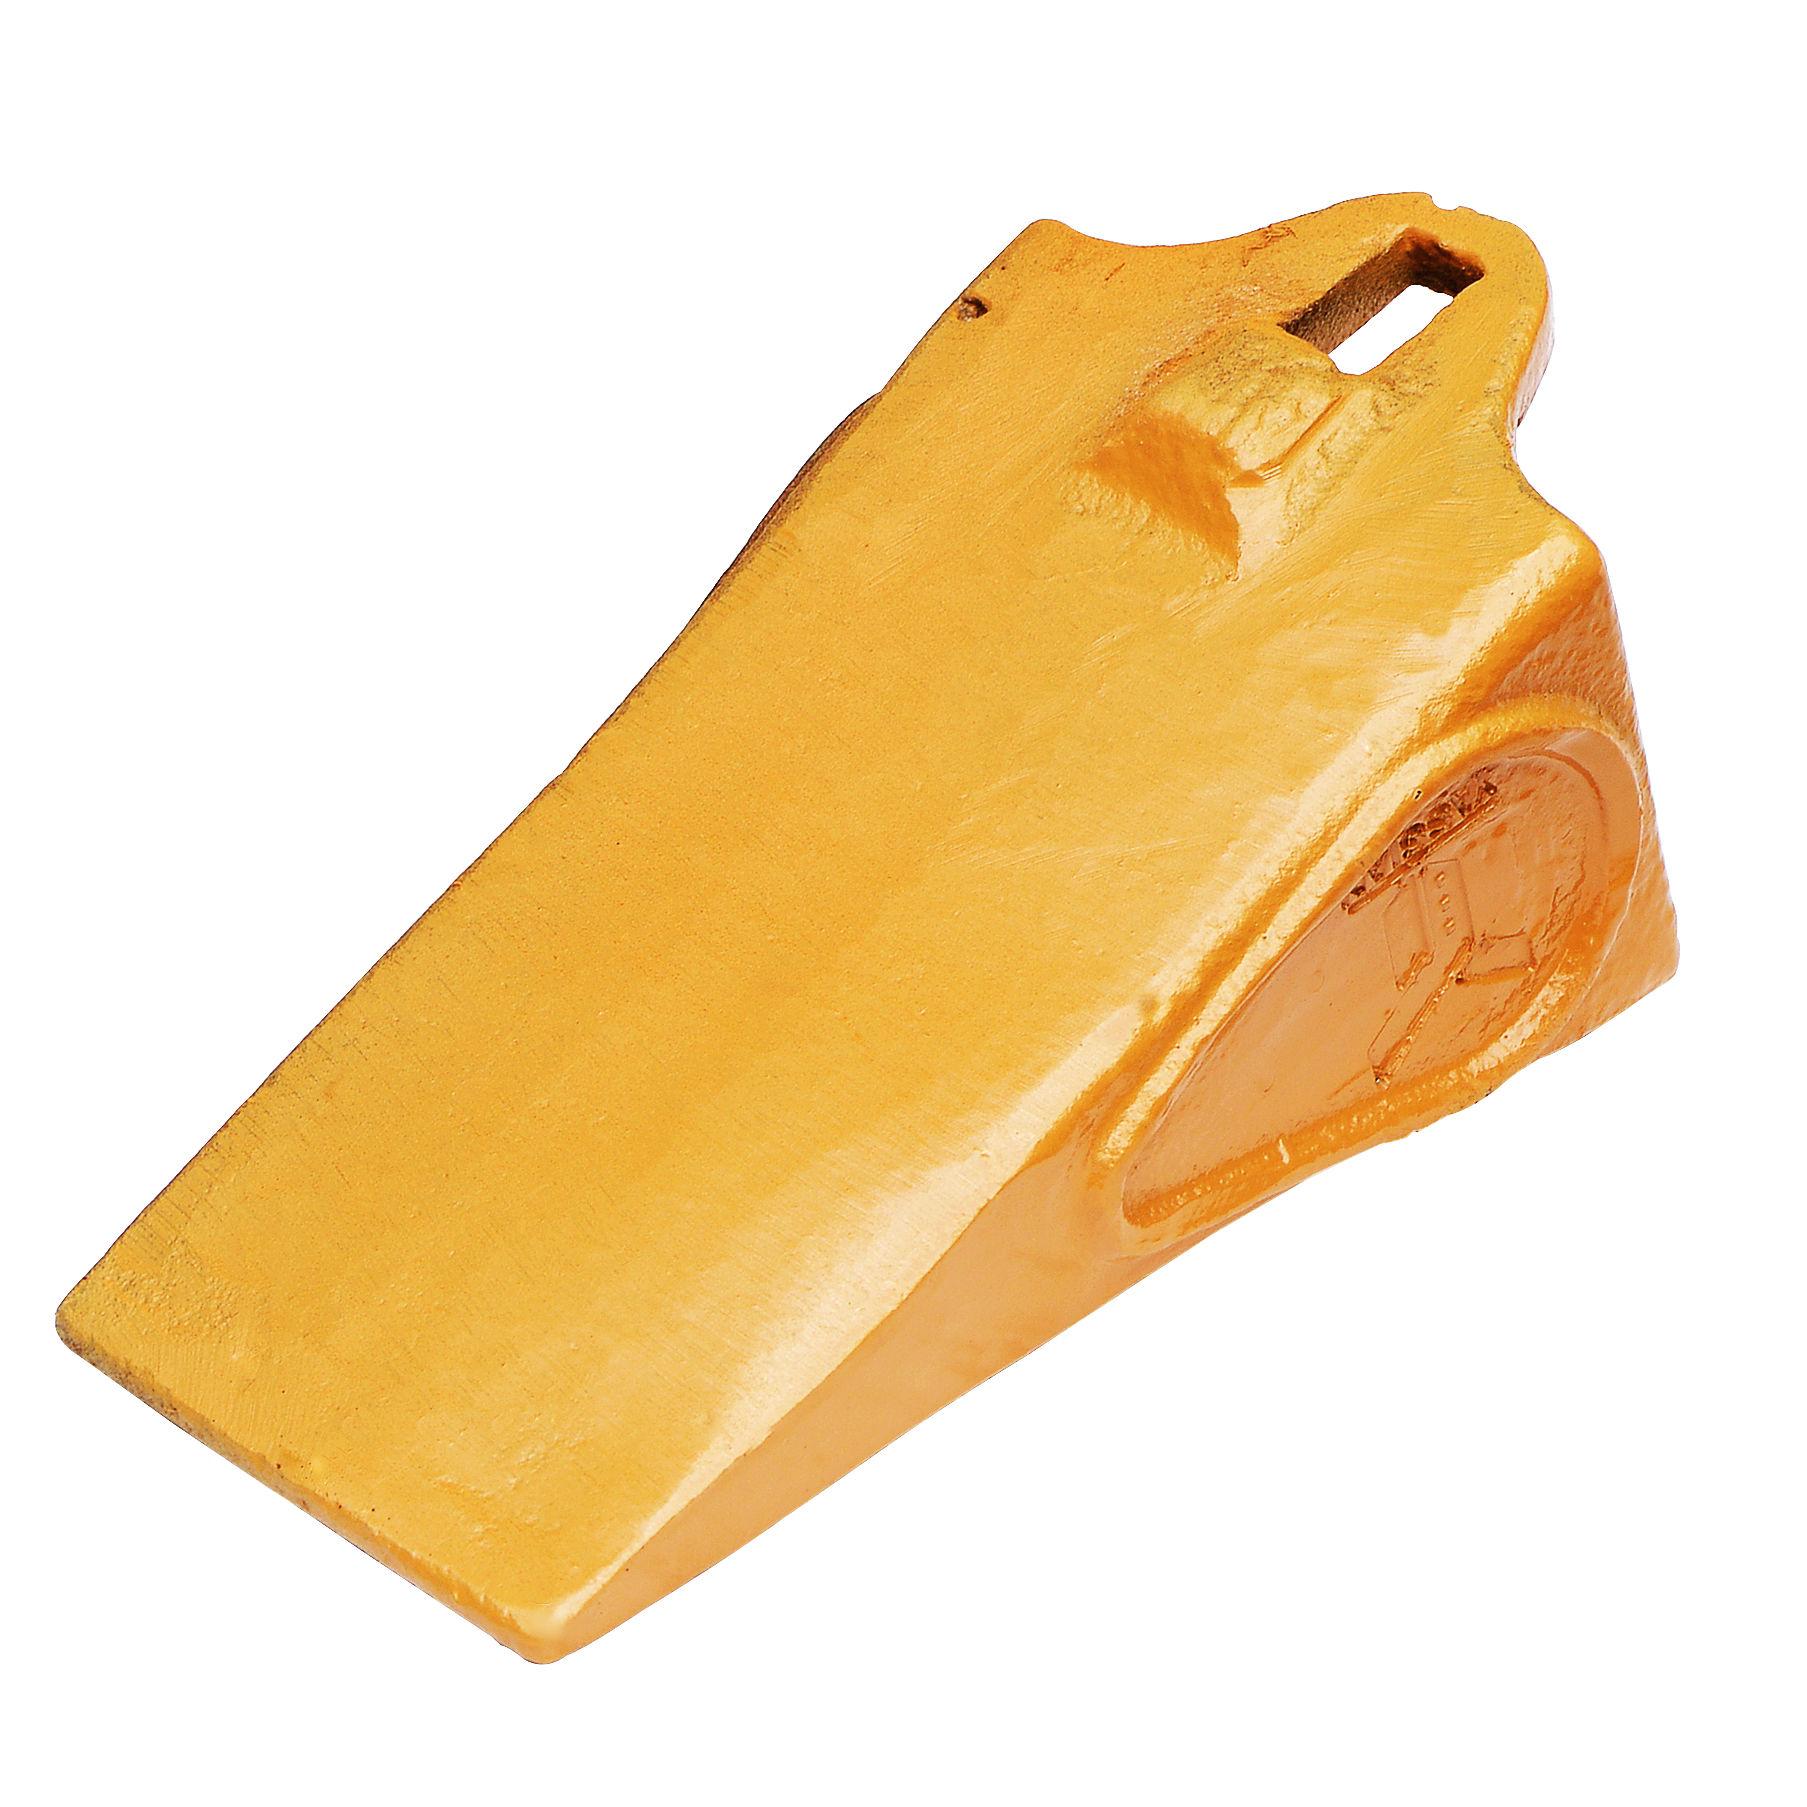 Fabrik produziert hochwertige standard teethattachment zahn teilenummer 1U3252, 1U3302, 1U3352